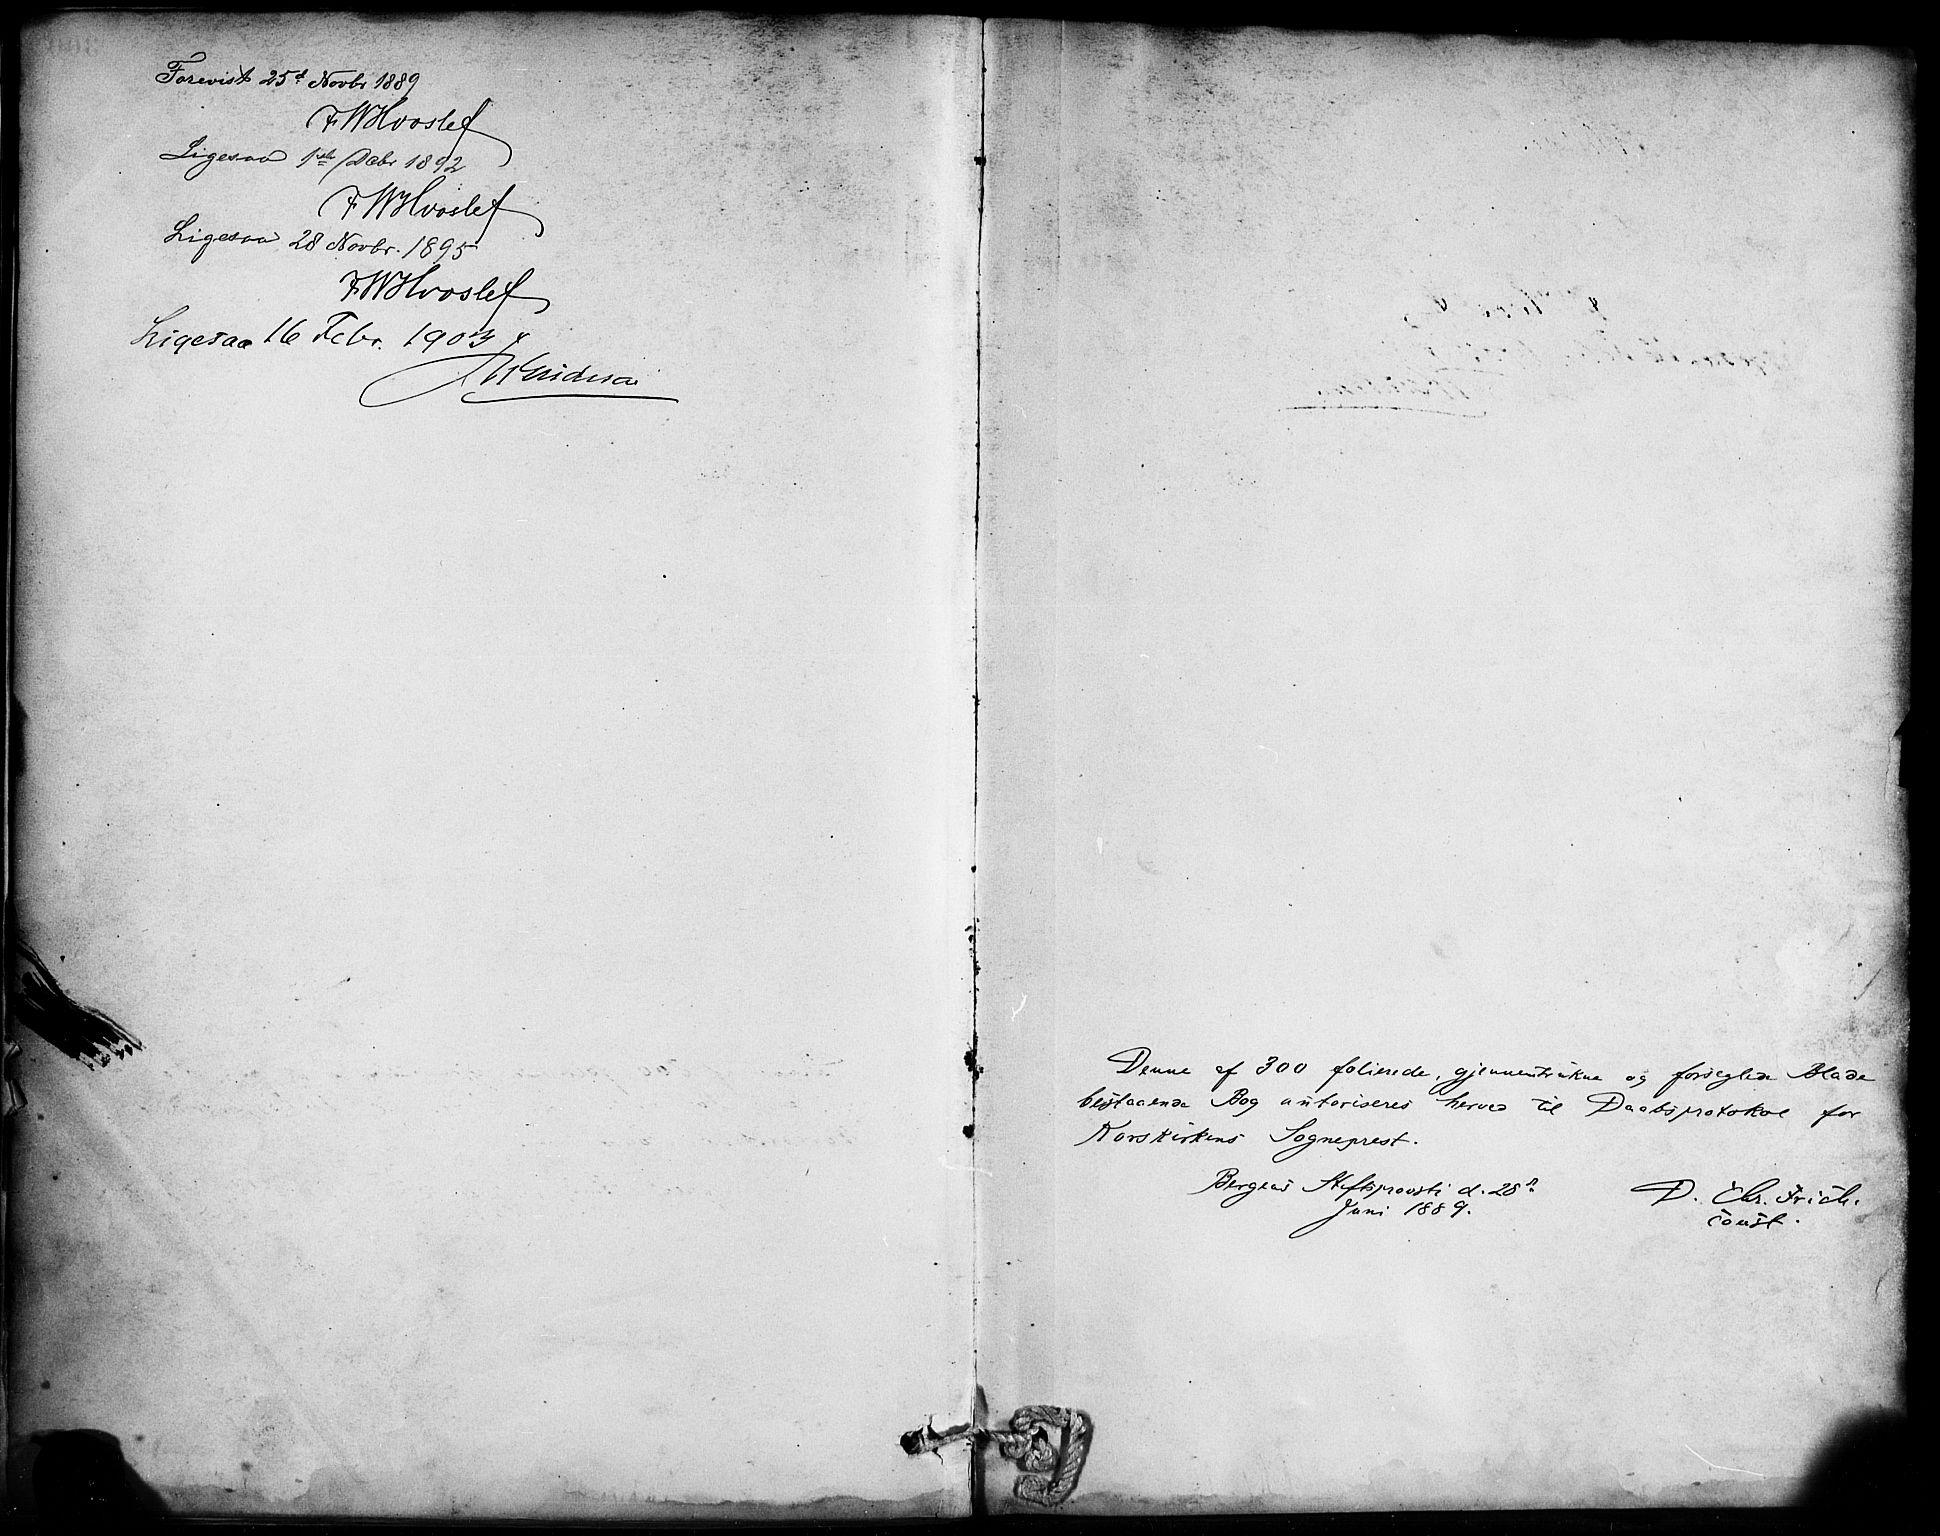 SAB, Korskirken Sokneprestembete, H/Haa/L0022: Ministerialbok nr. B 8, 1889-1899